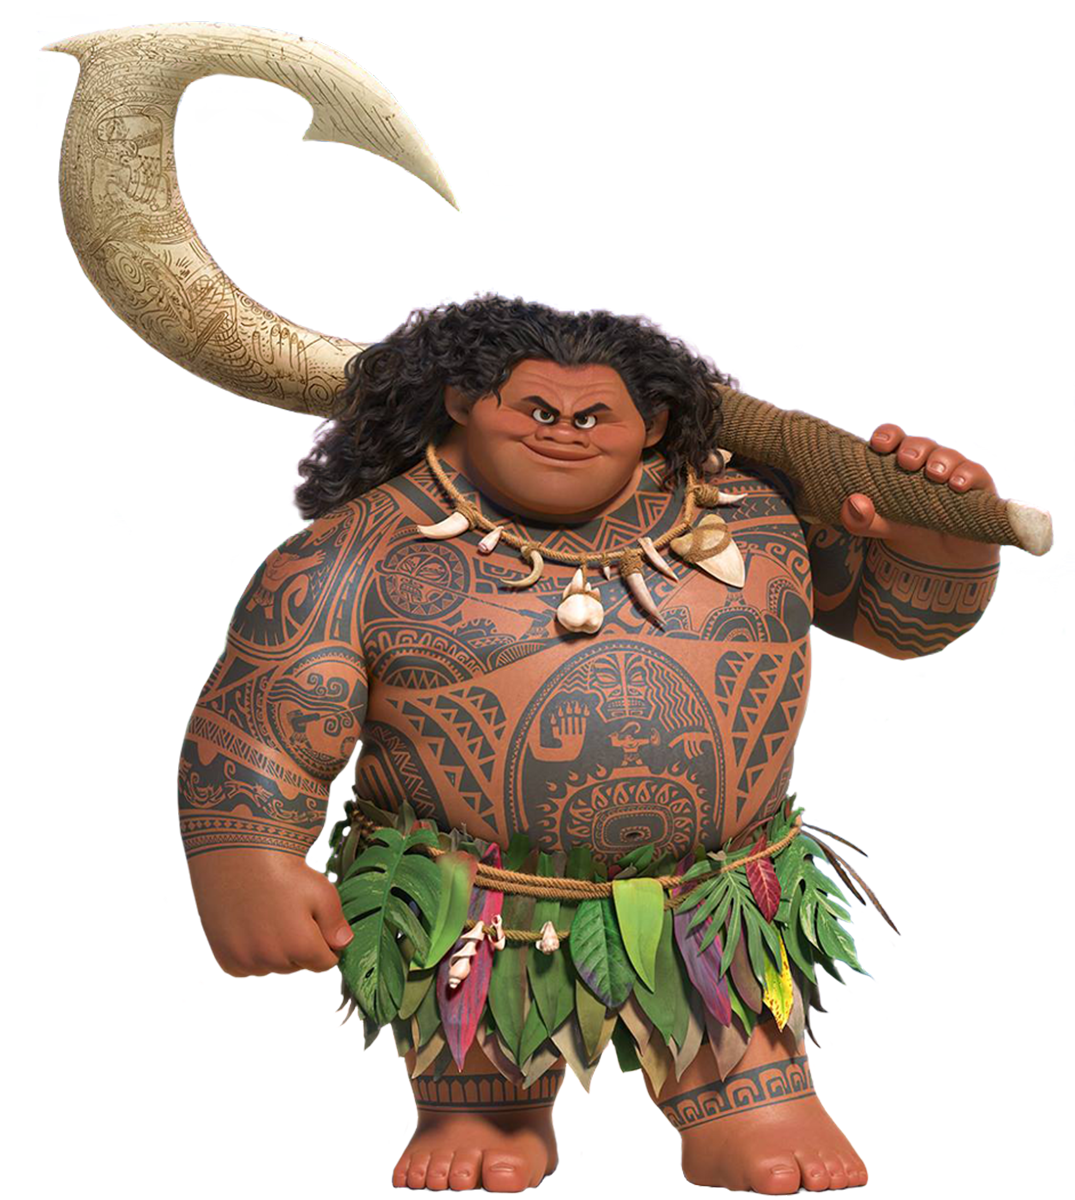 Moana Maui 01 Png 1075 1200 Moana Da Disney Tatuagem Maui Desenhos Moana